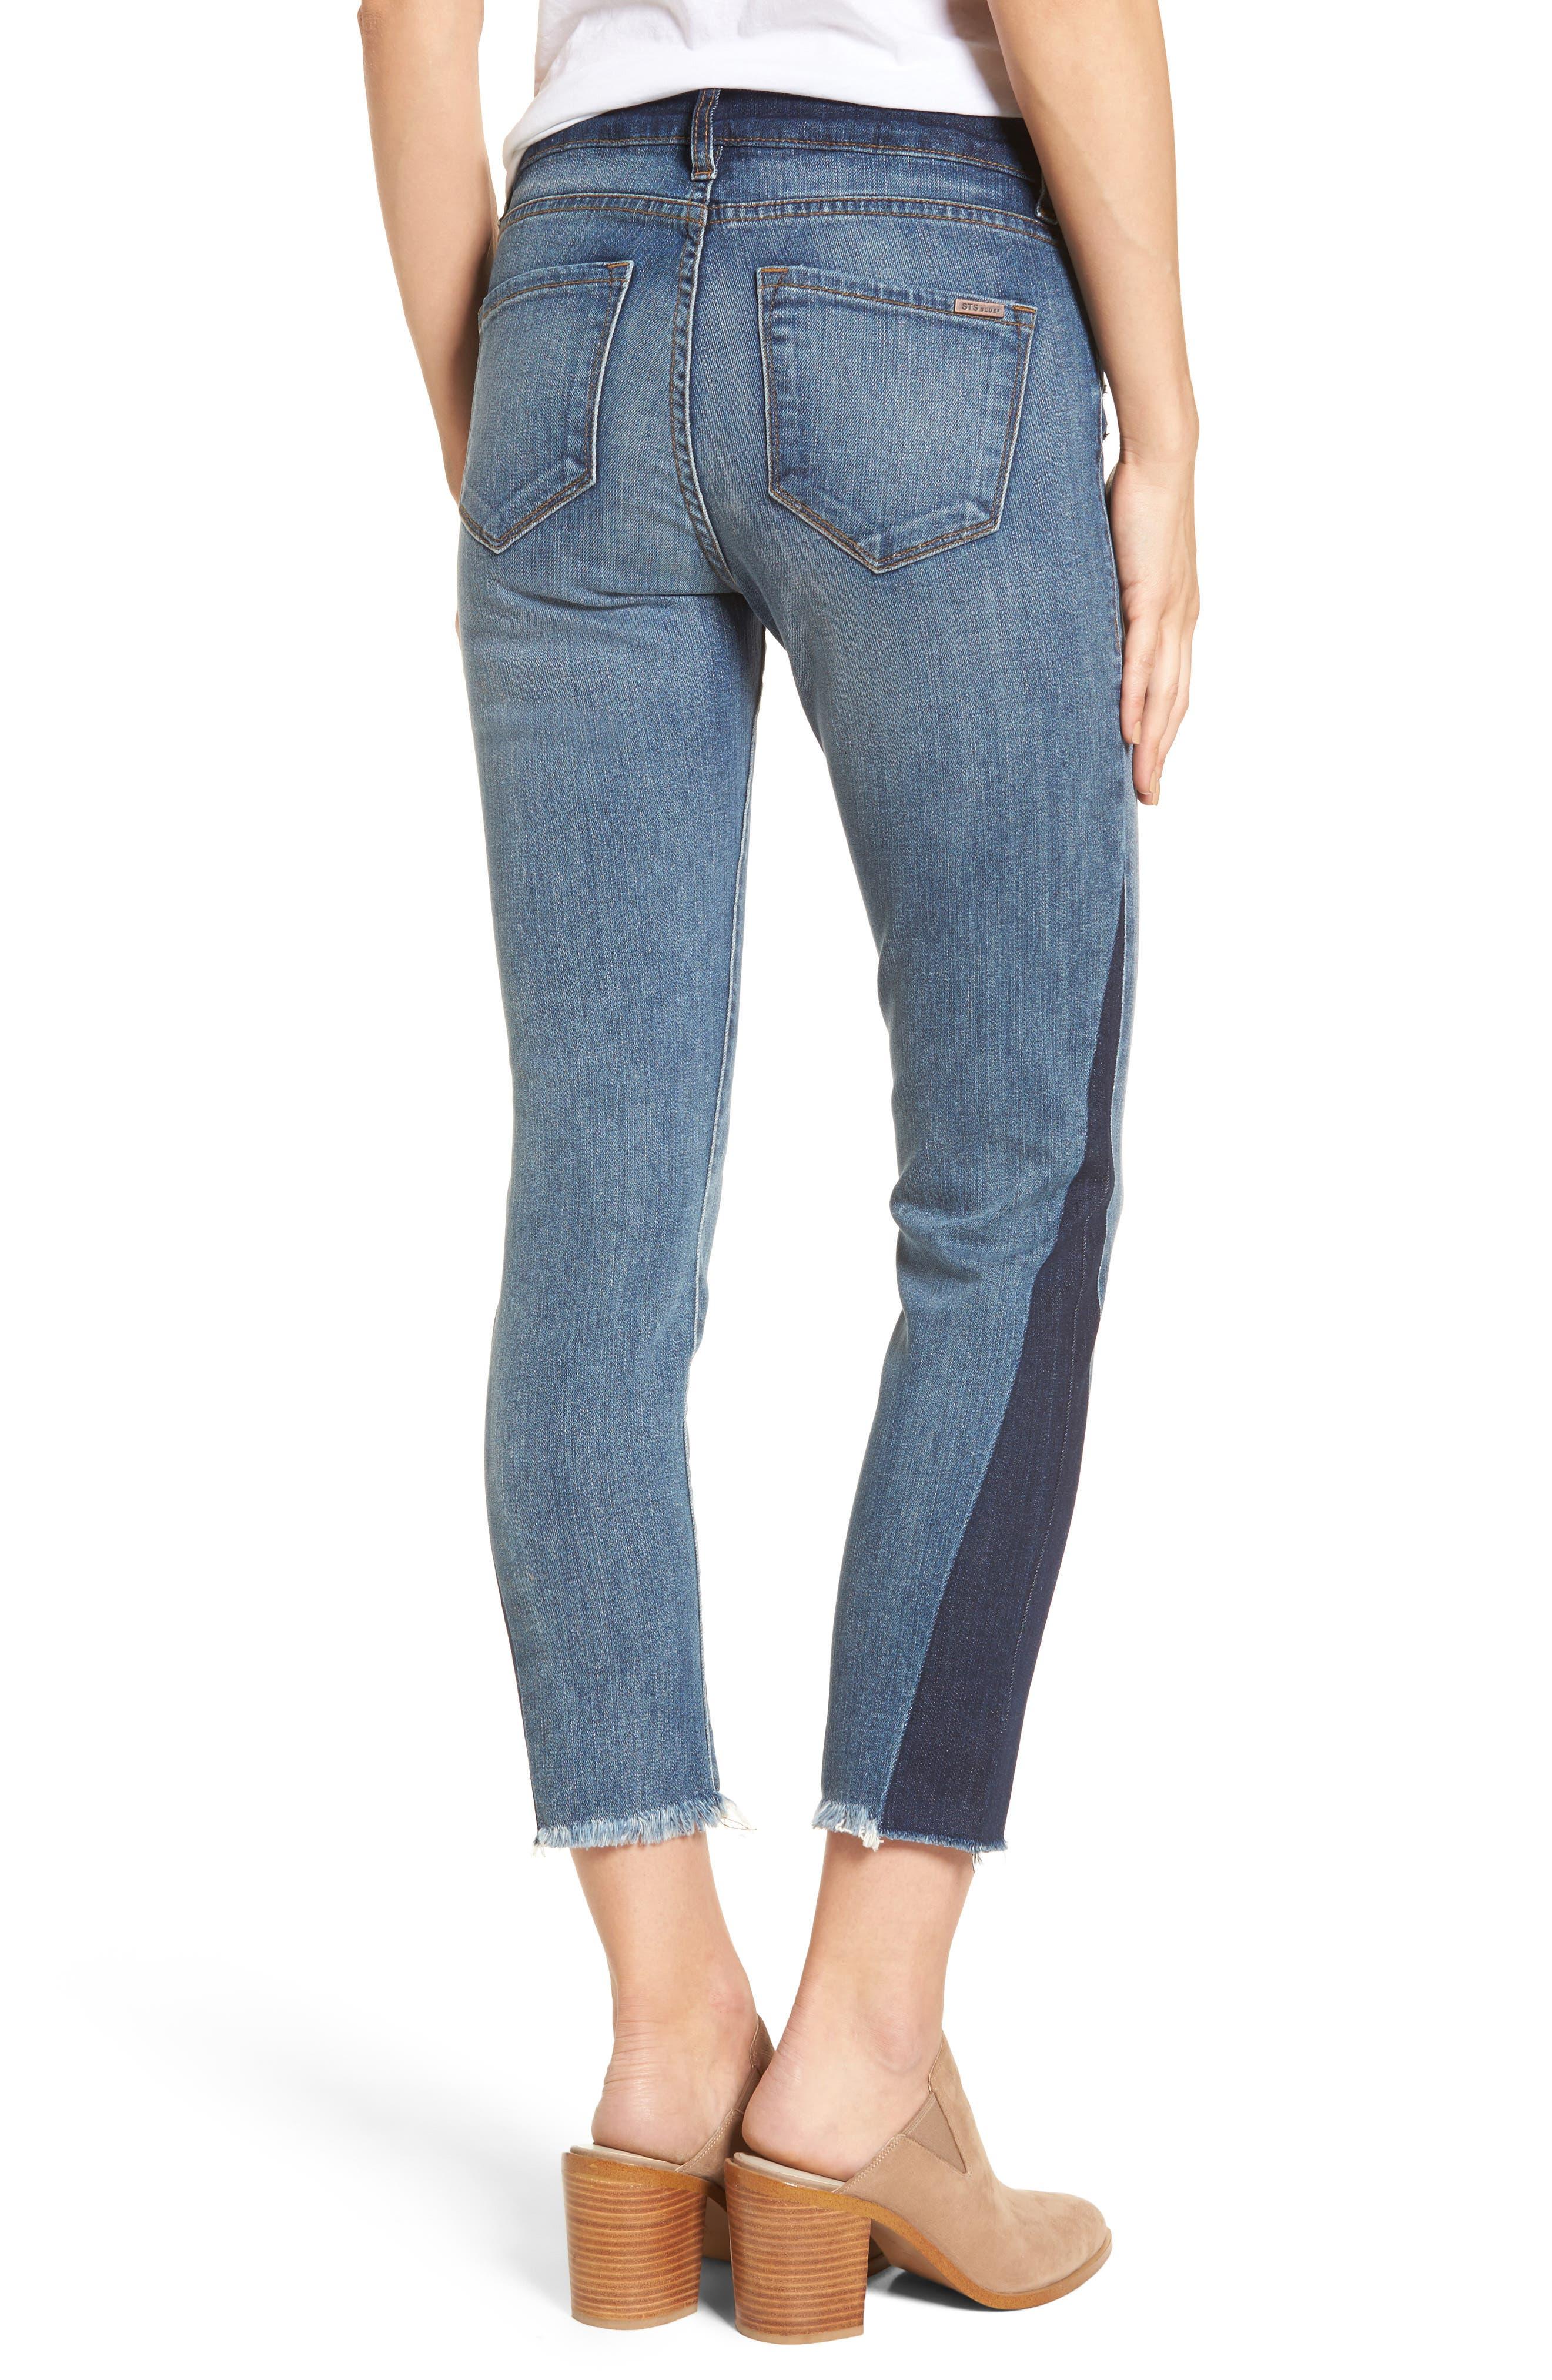 Taylor Colorblock Straight Leg Jeans,                             Alternate thumbnail 2, color,